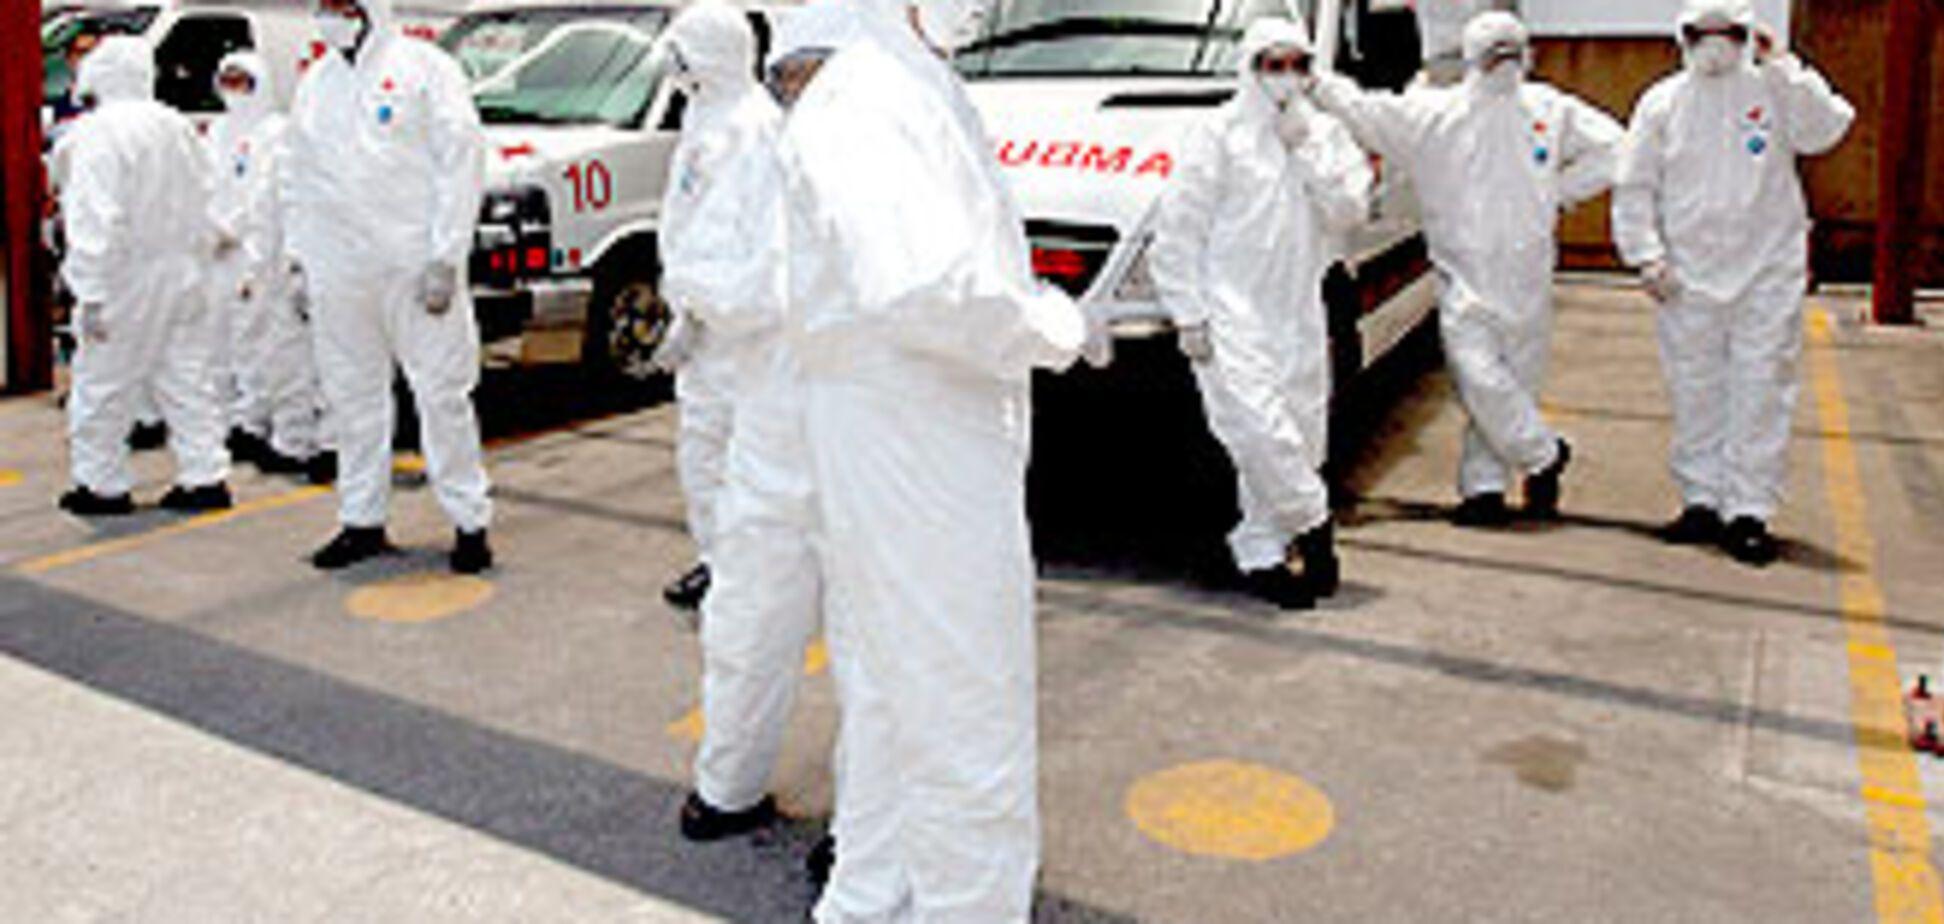 Вспышку гриппа A/H1N1 удалось усмирить